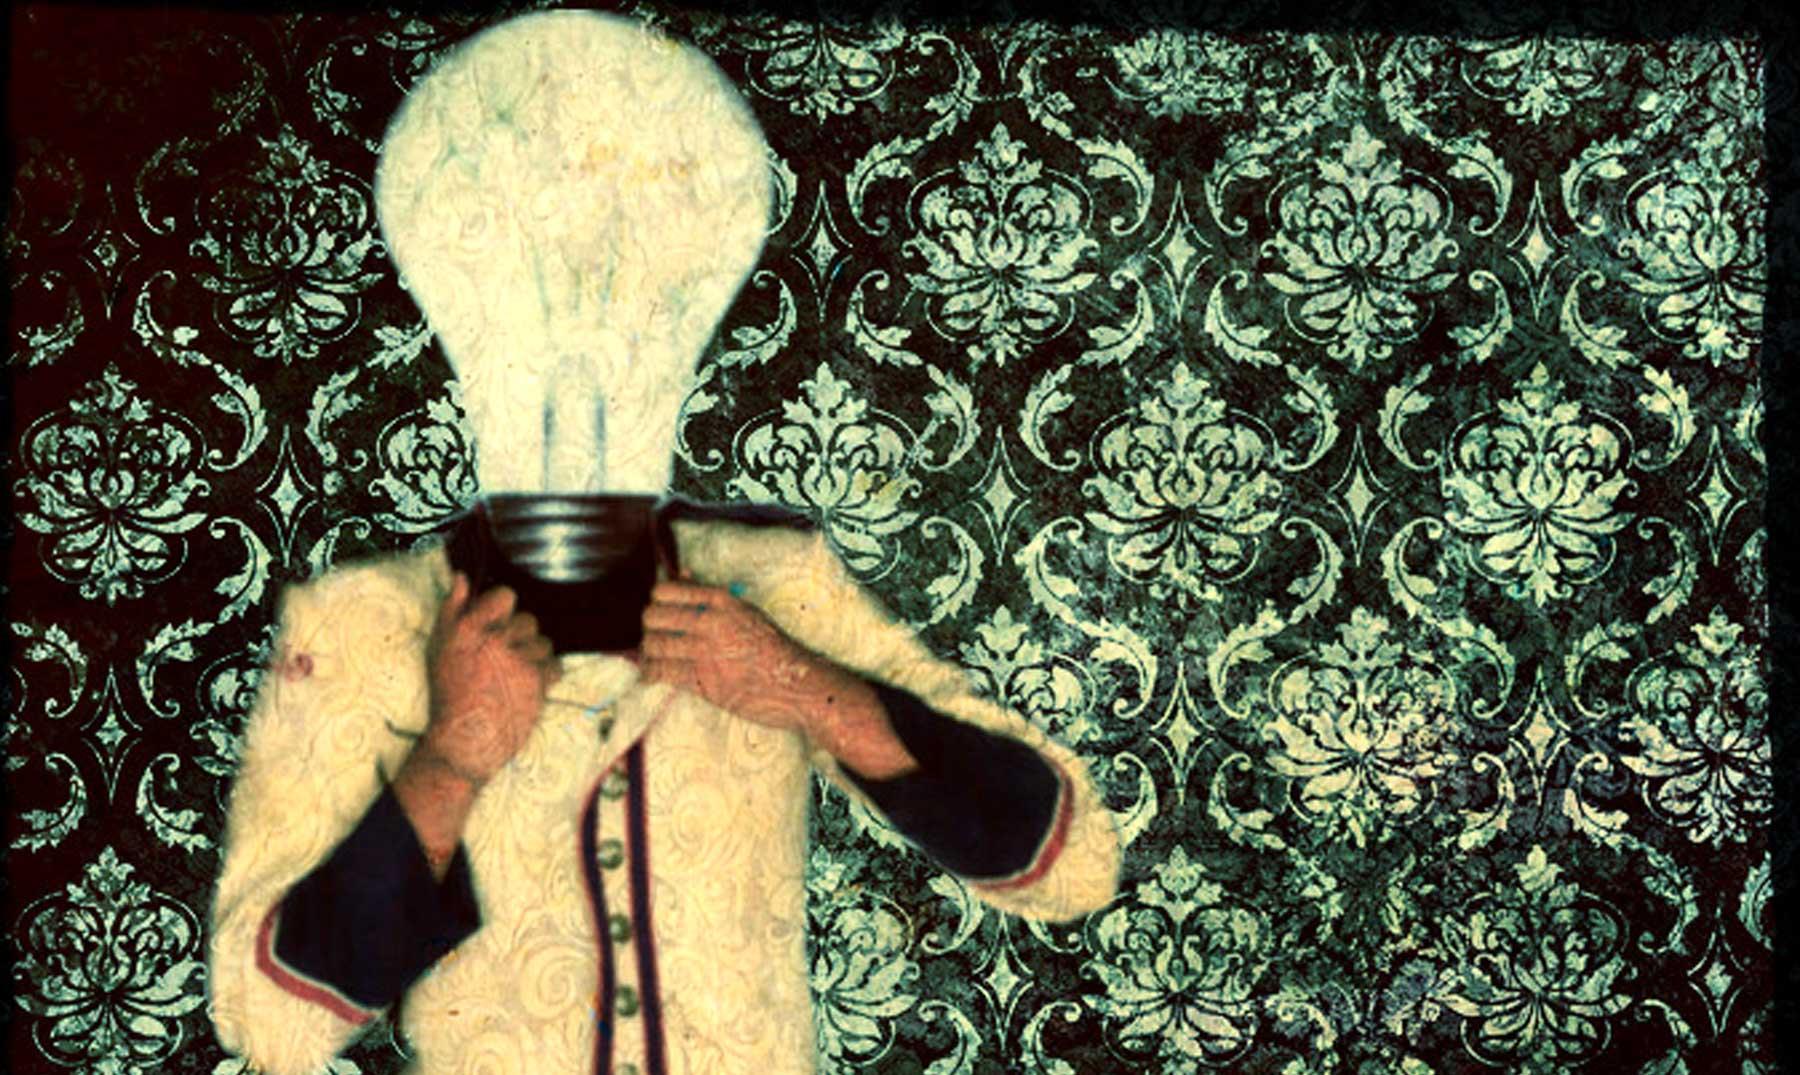 6 acertijos para divertirse pensando (I)